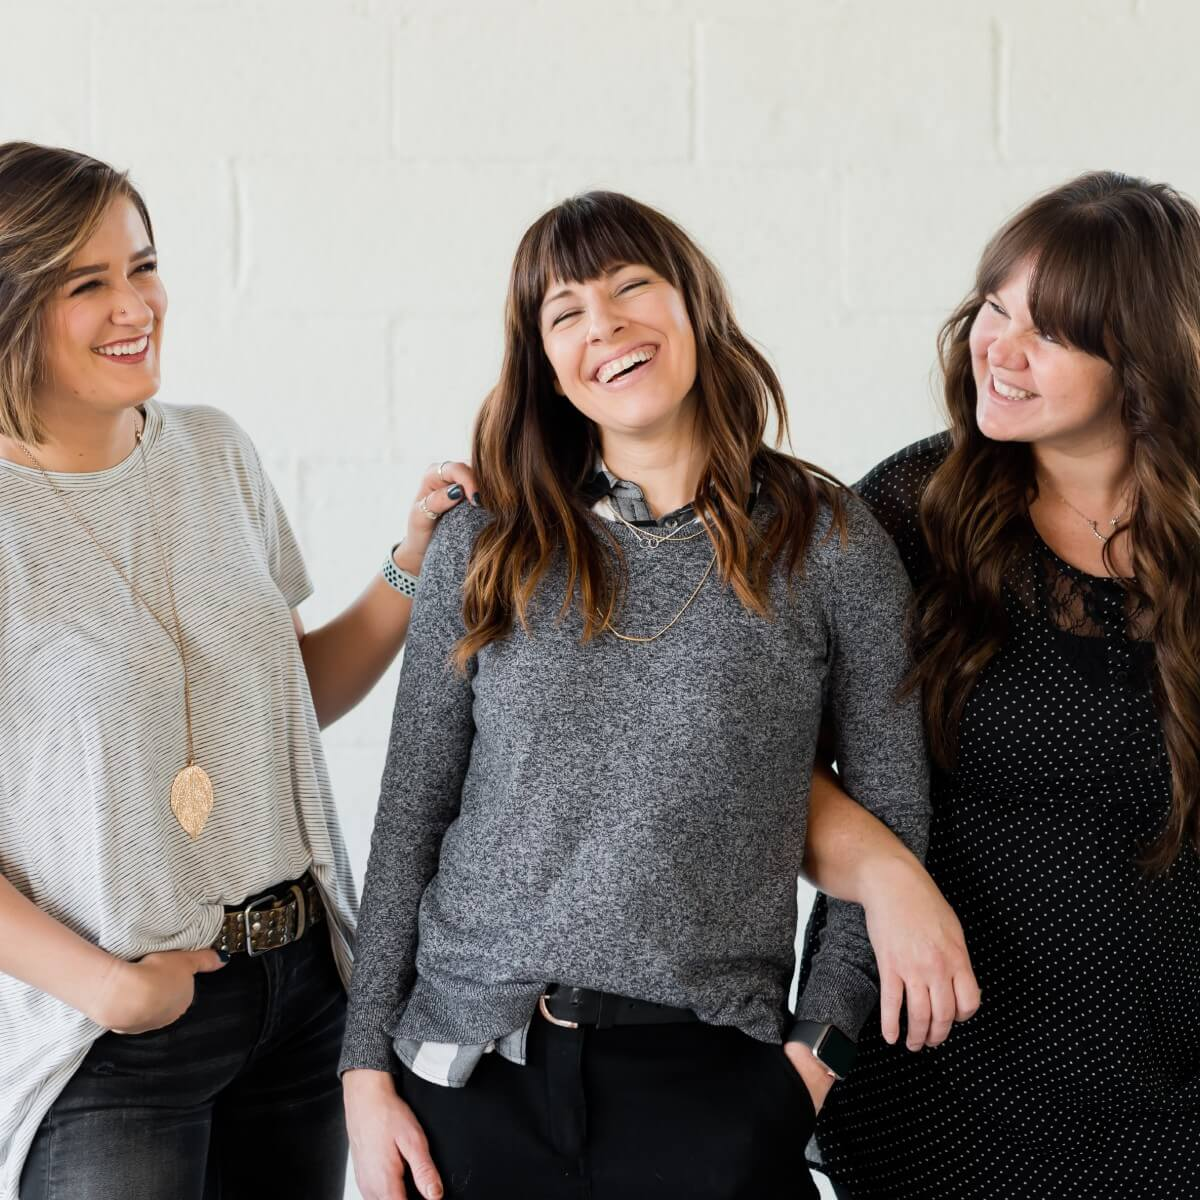 tres mujeres riendose